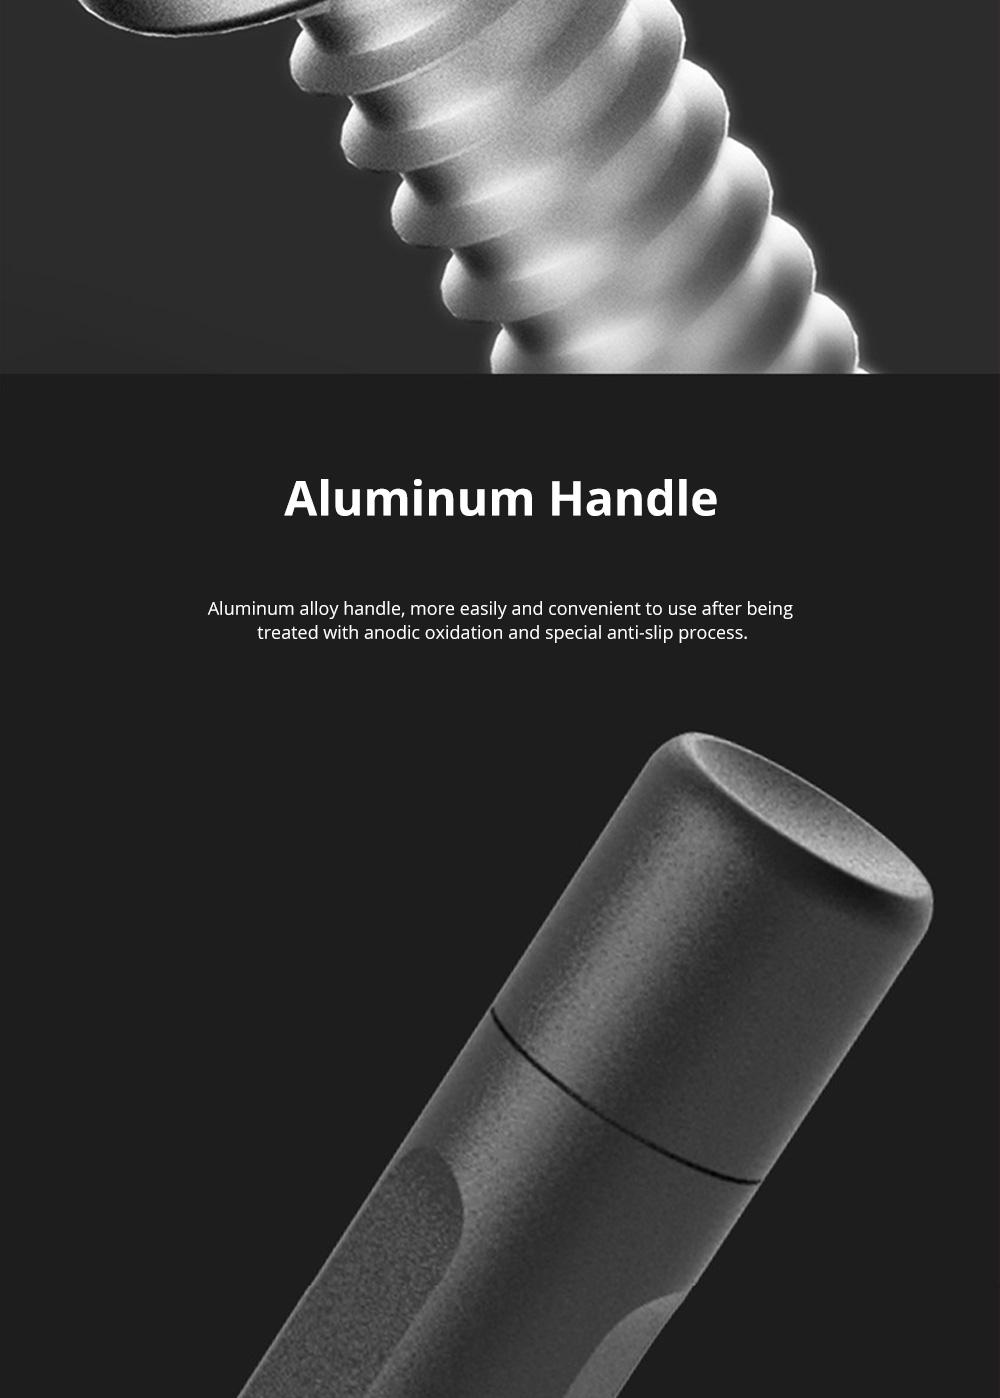 MI Wiha Precision Screwdrivers Set 25 in 1 Household Repair Tool Kits with Aluminum Storage Box for Appliance Repair 4